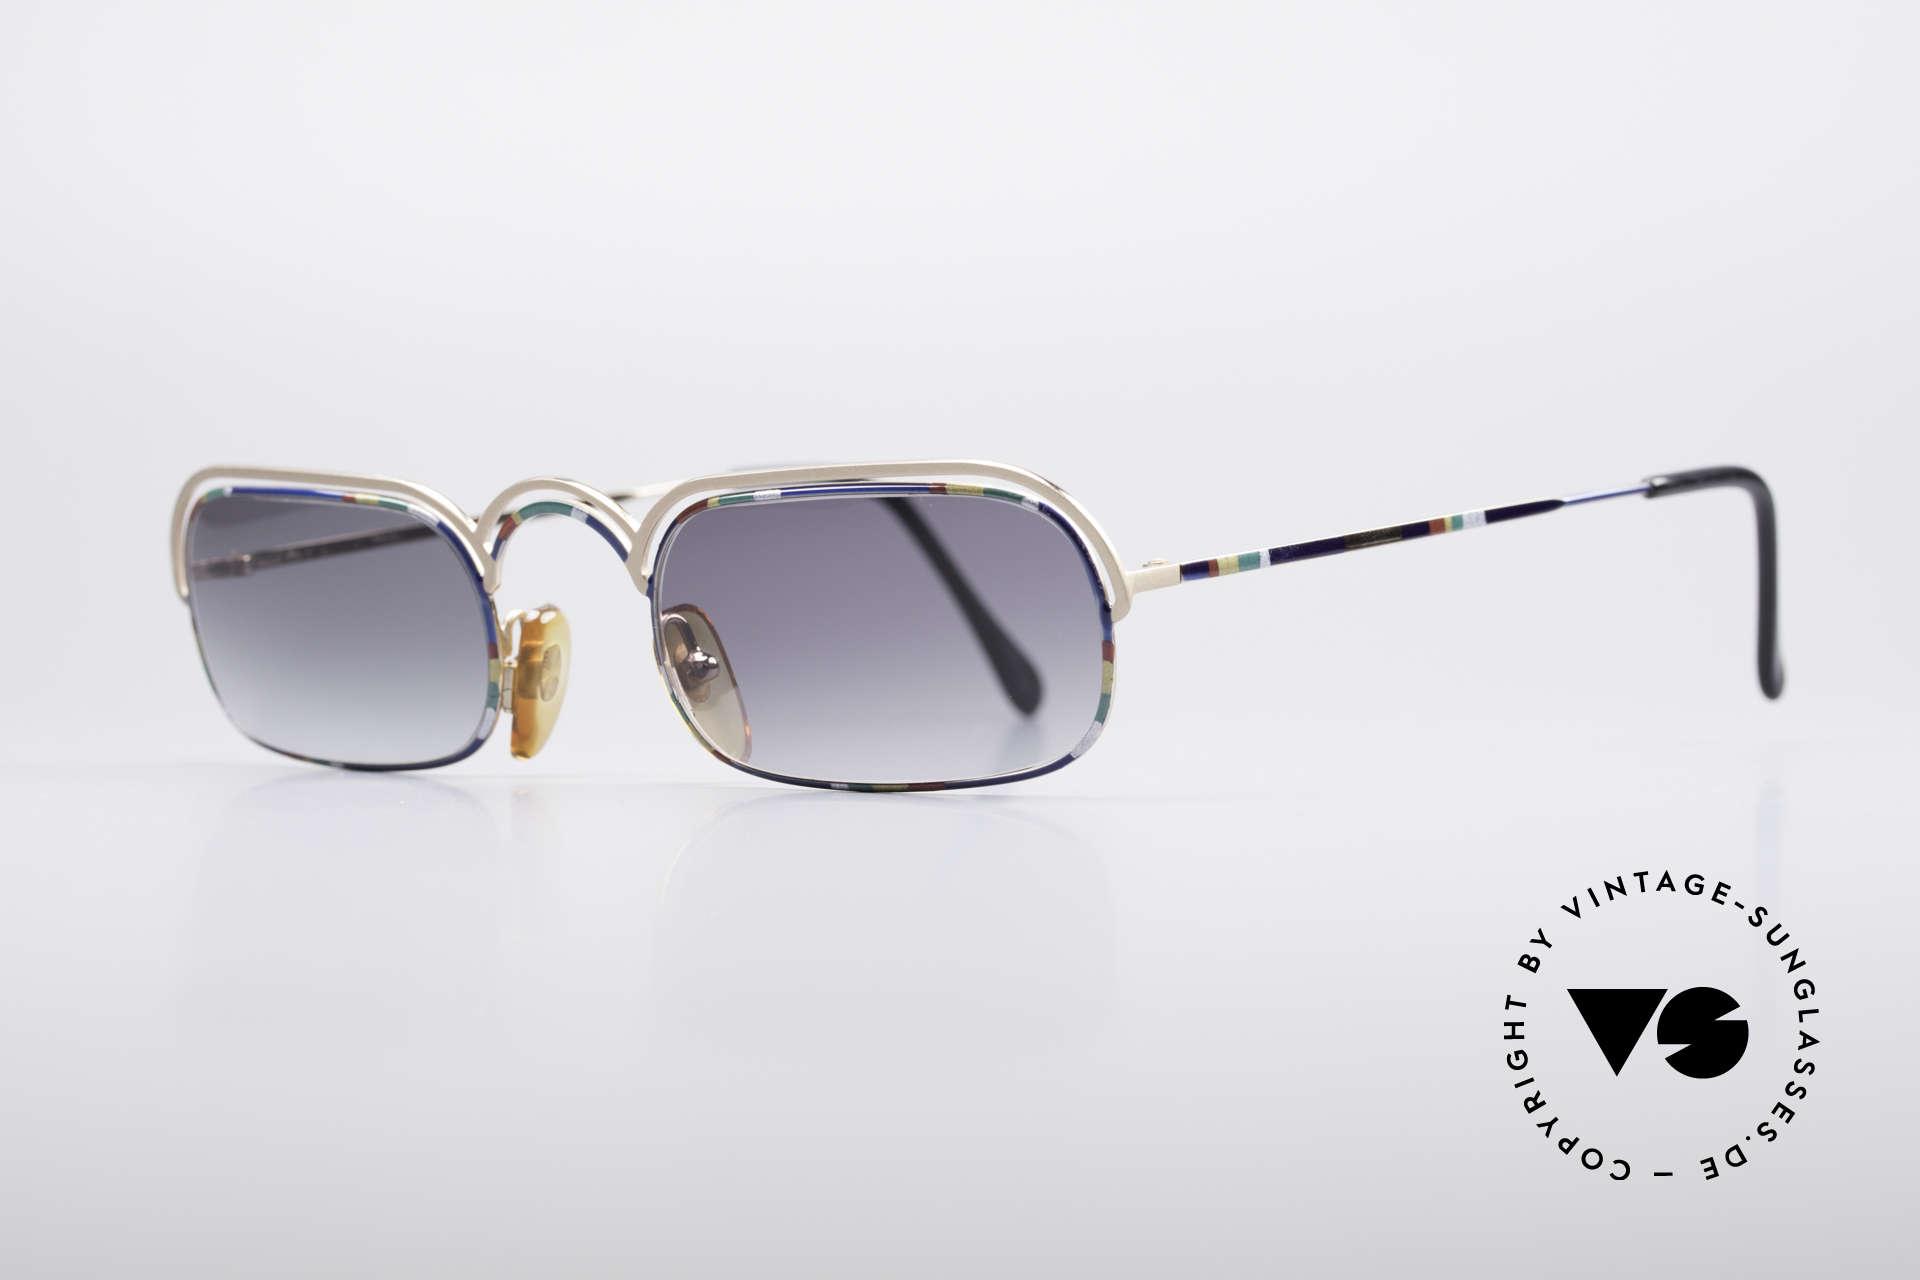 Casanova DV14 Dolce Vita Sunglasses, at the time of the Italian writer Giacomo G. Casanova, Made for Men and Women